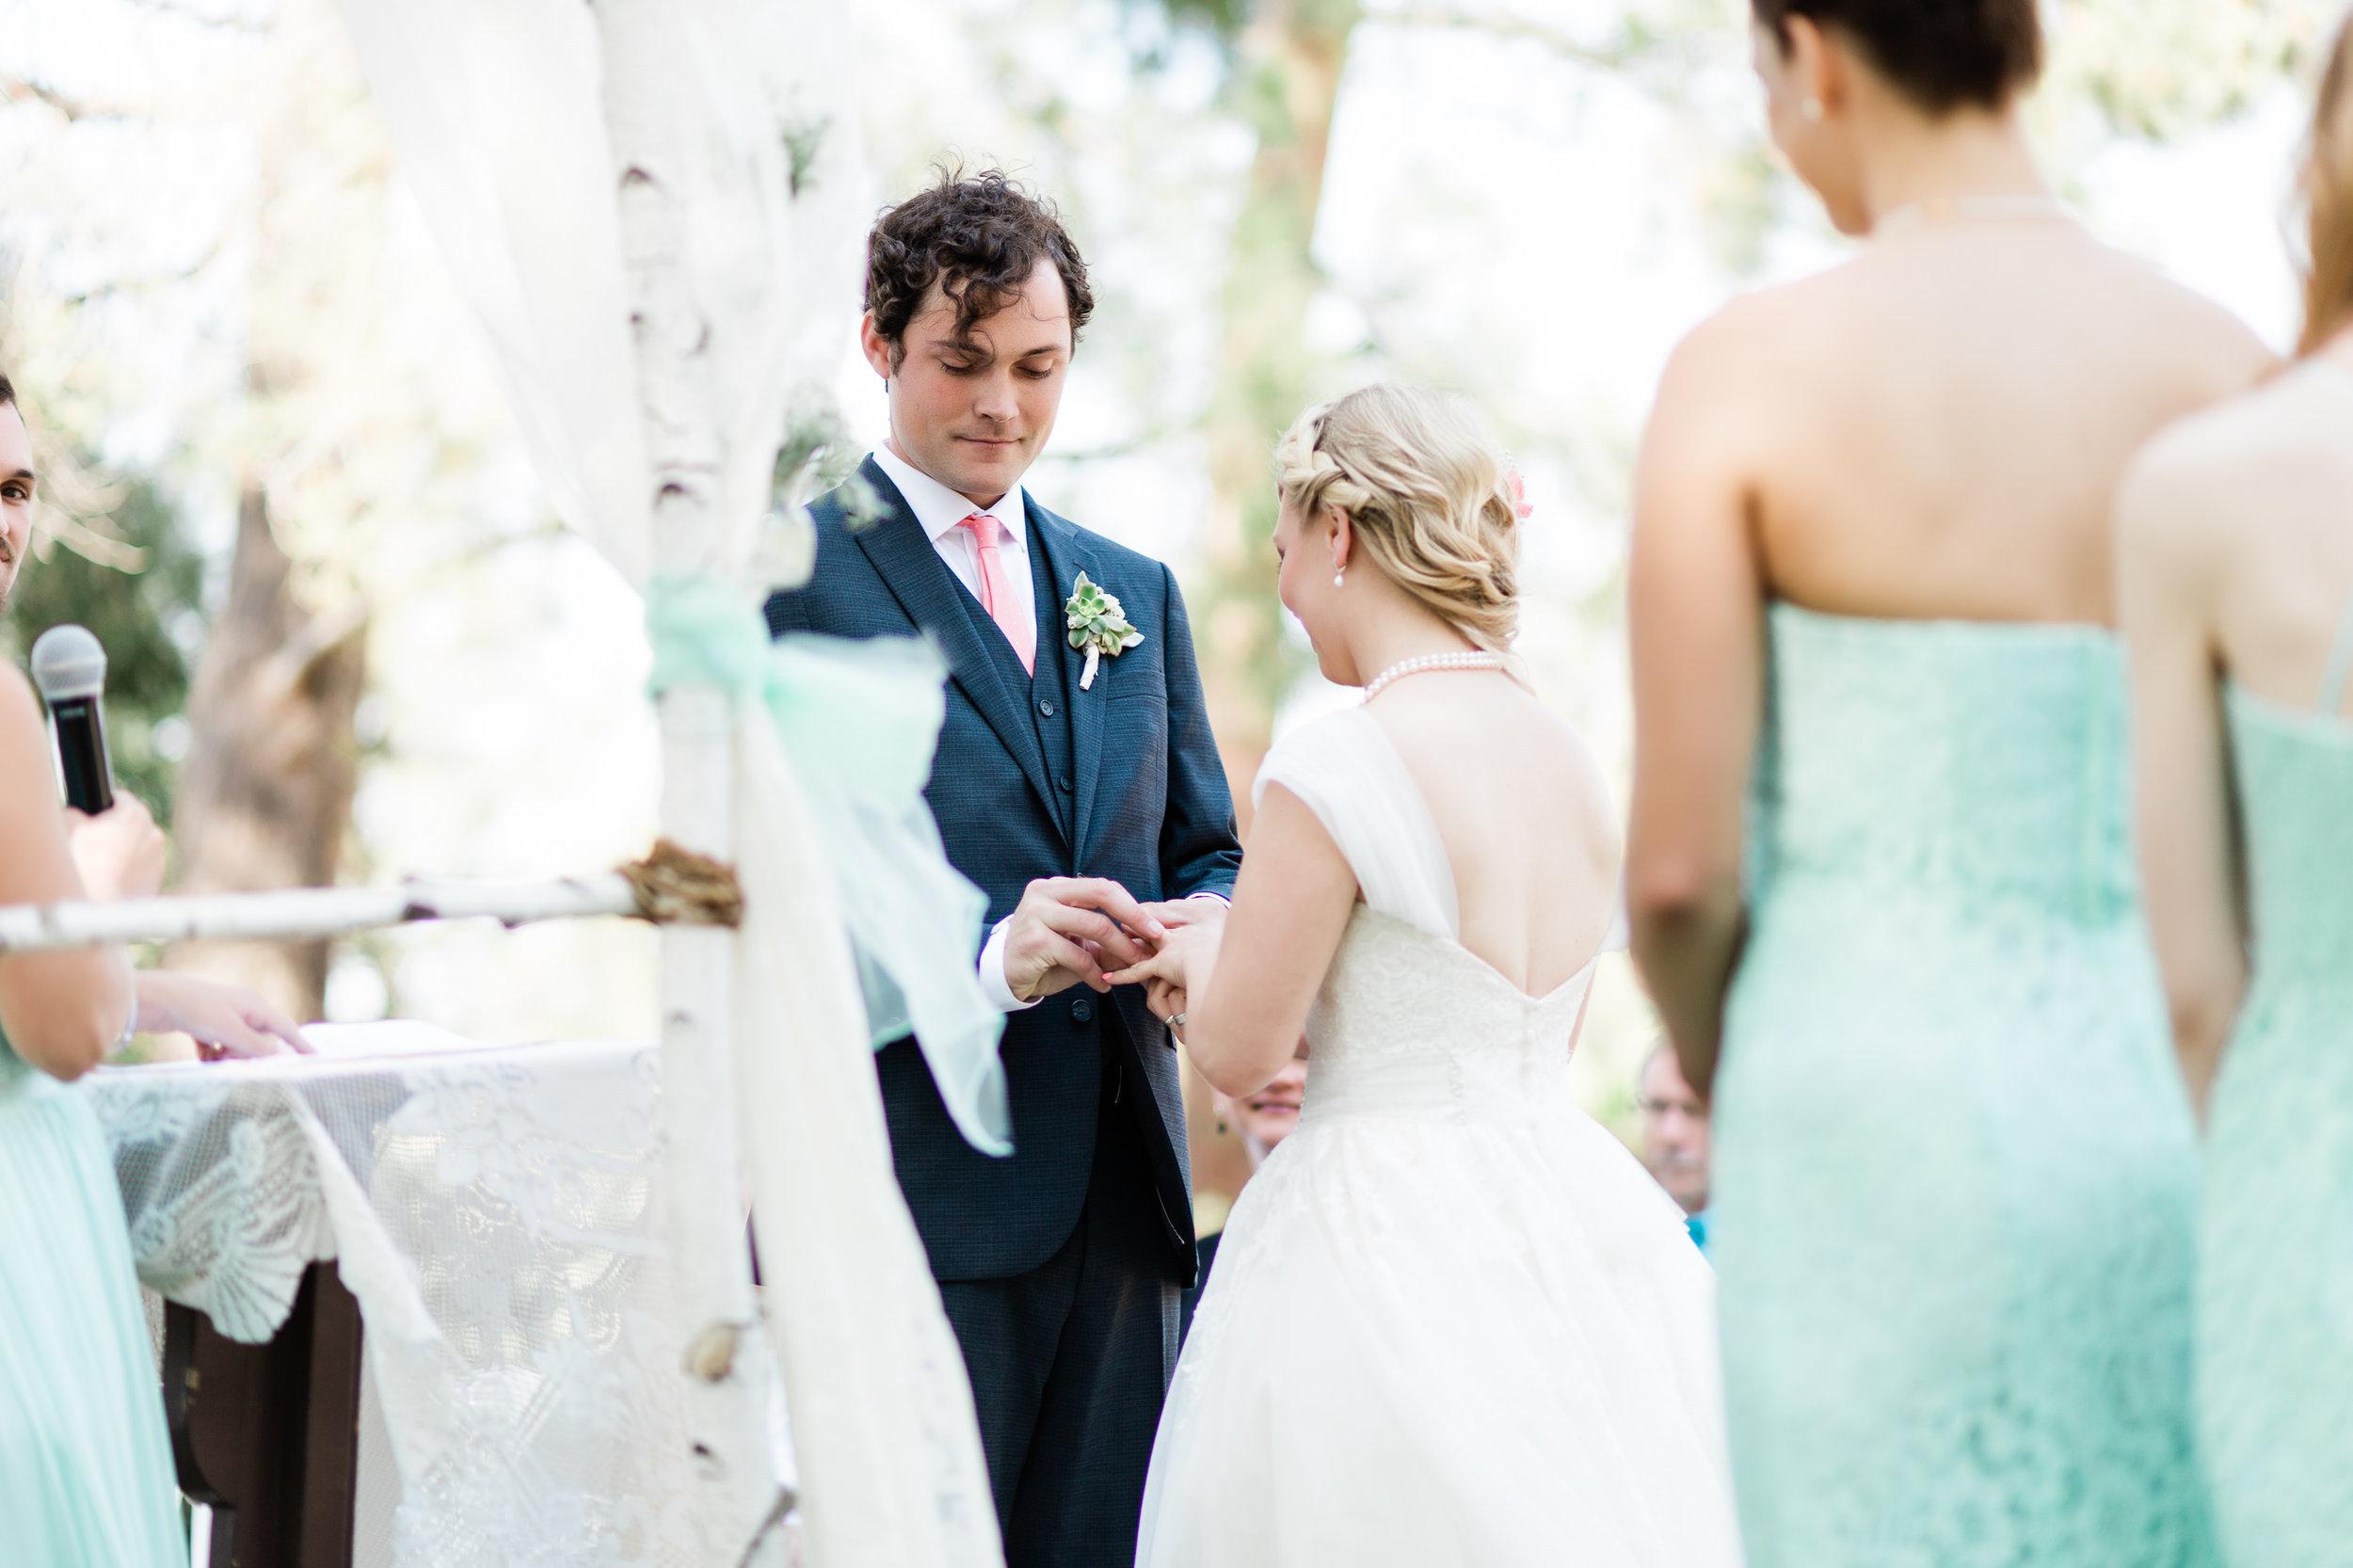 05_29_16_Kaminski_Angle_Wedding_2166-Edit.jpg